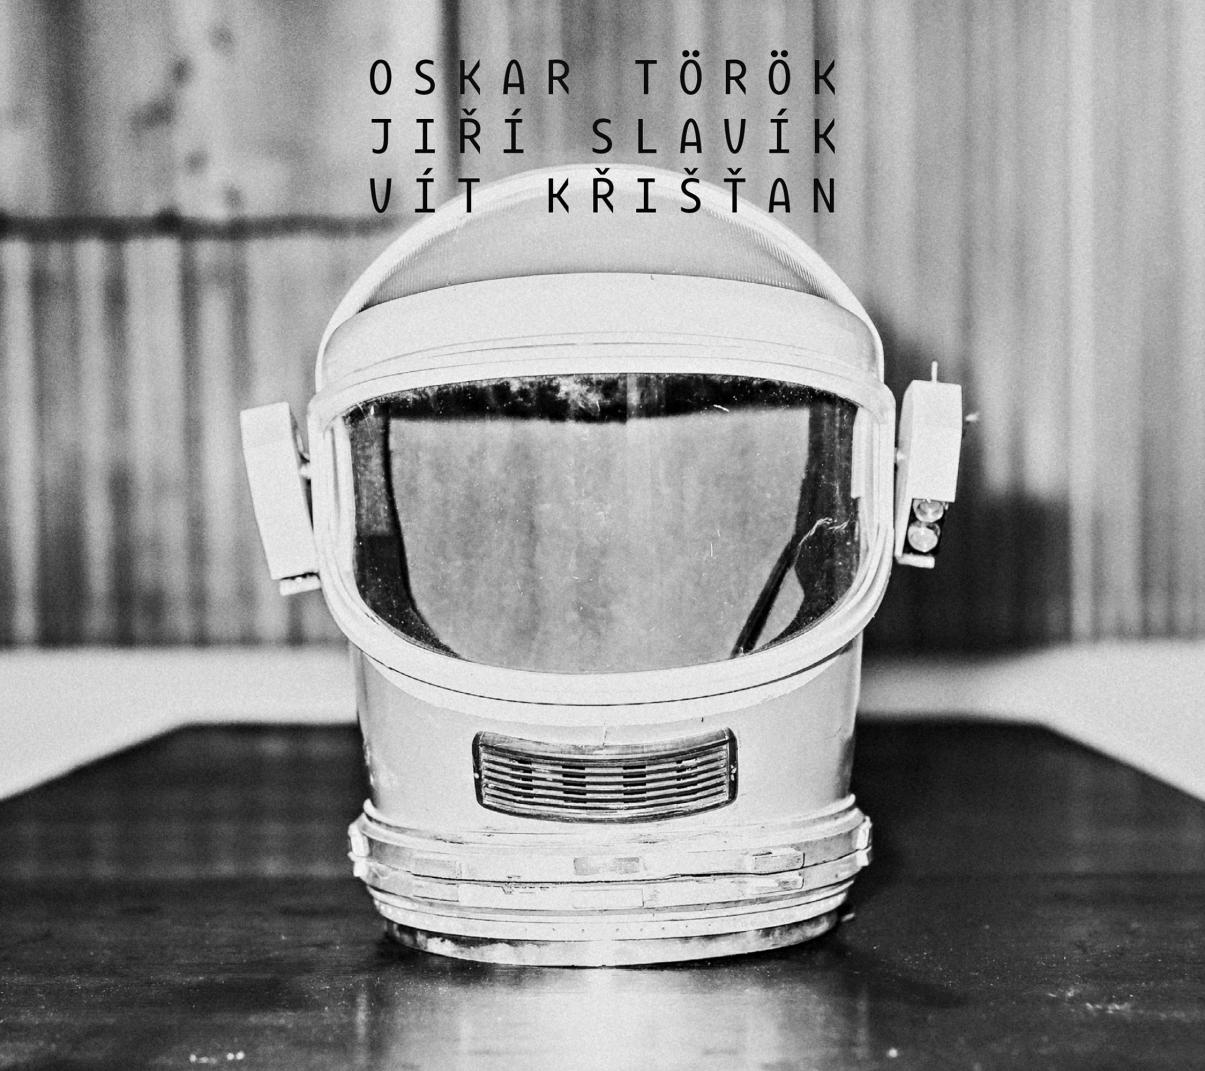 Oskar Torok,  Jiri Slavik, Vit Kristan: Oskar Torok, Jiri Slavik, Vit  【予約受付中】